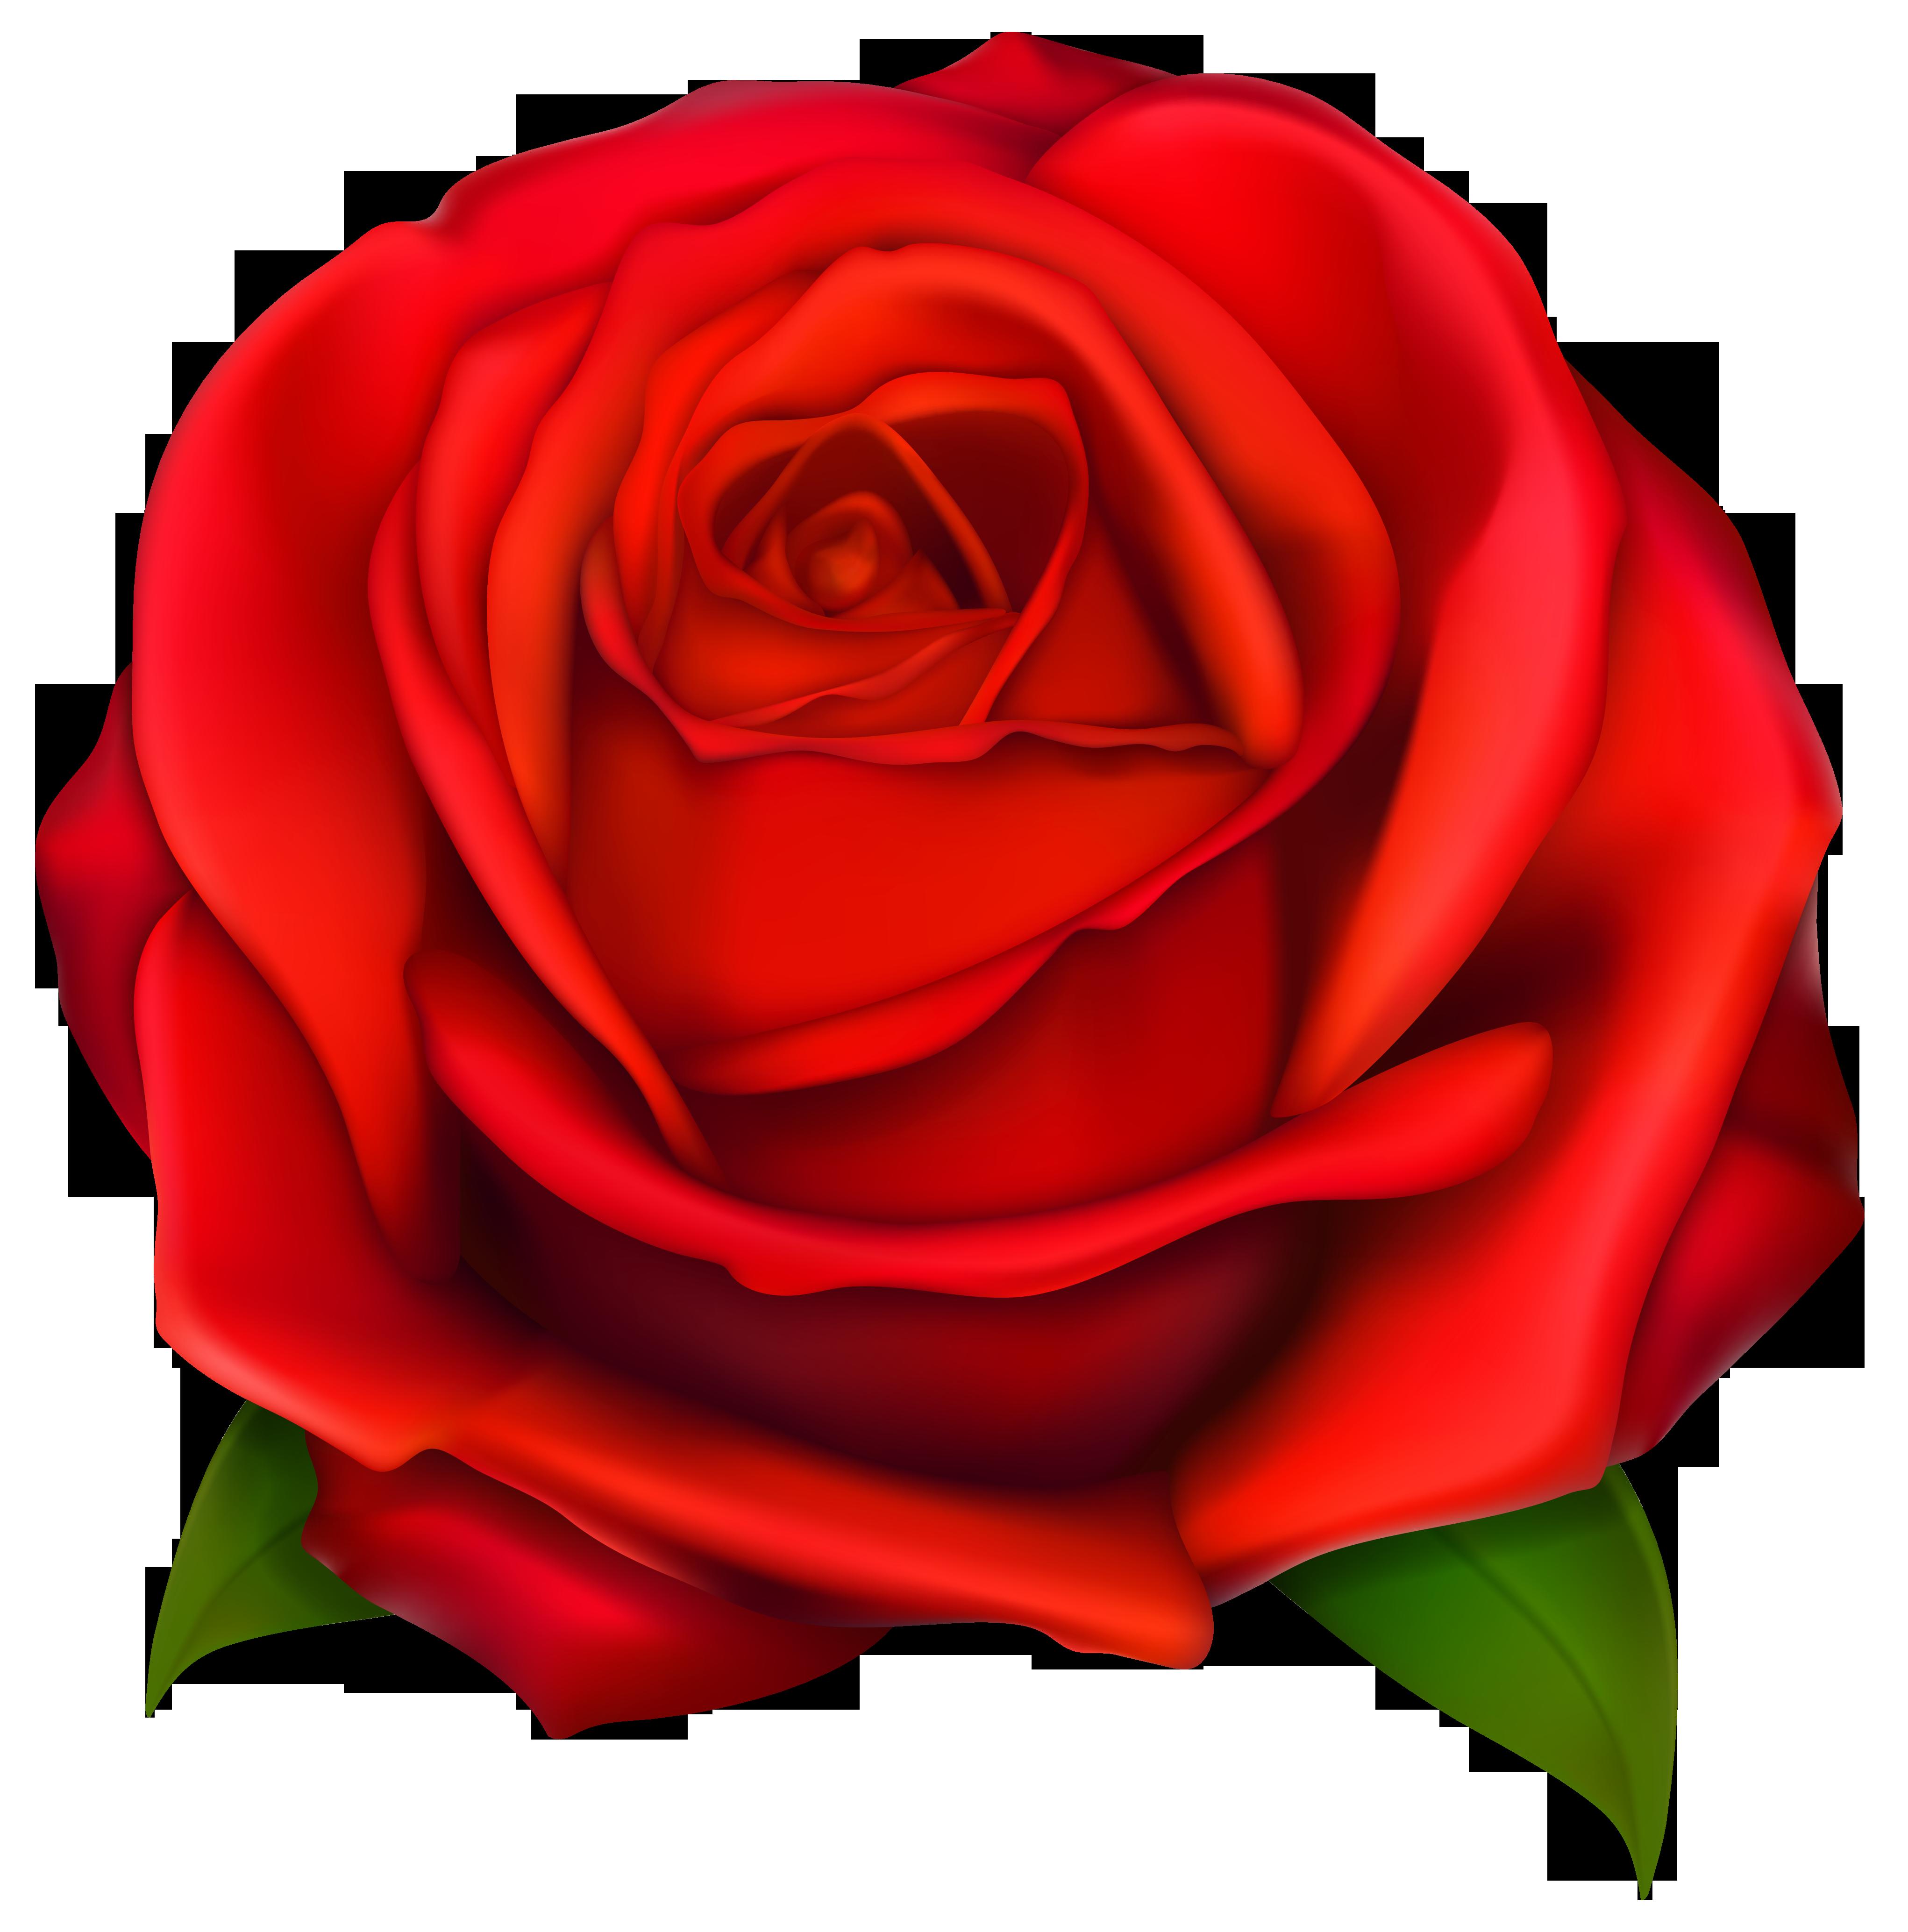 Roses free rose clipart public domain flower clip art images and graphics 4 - Clipartix